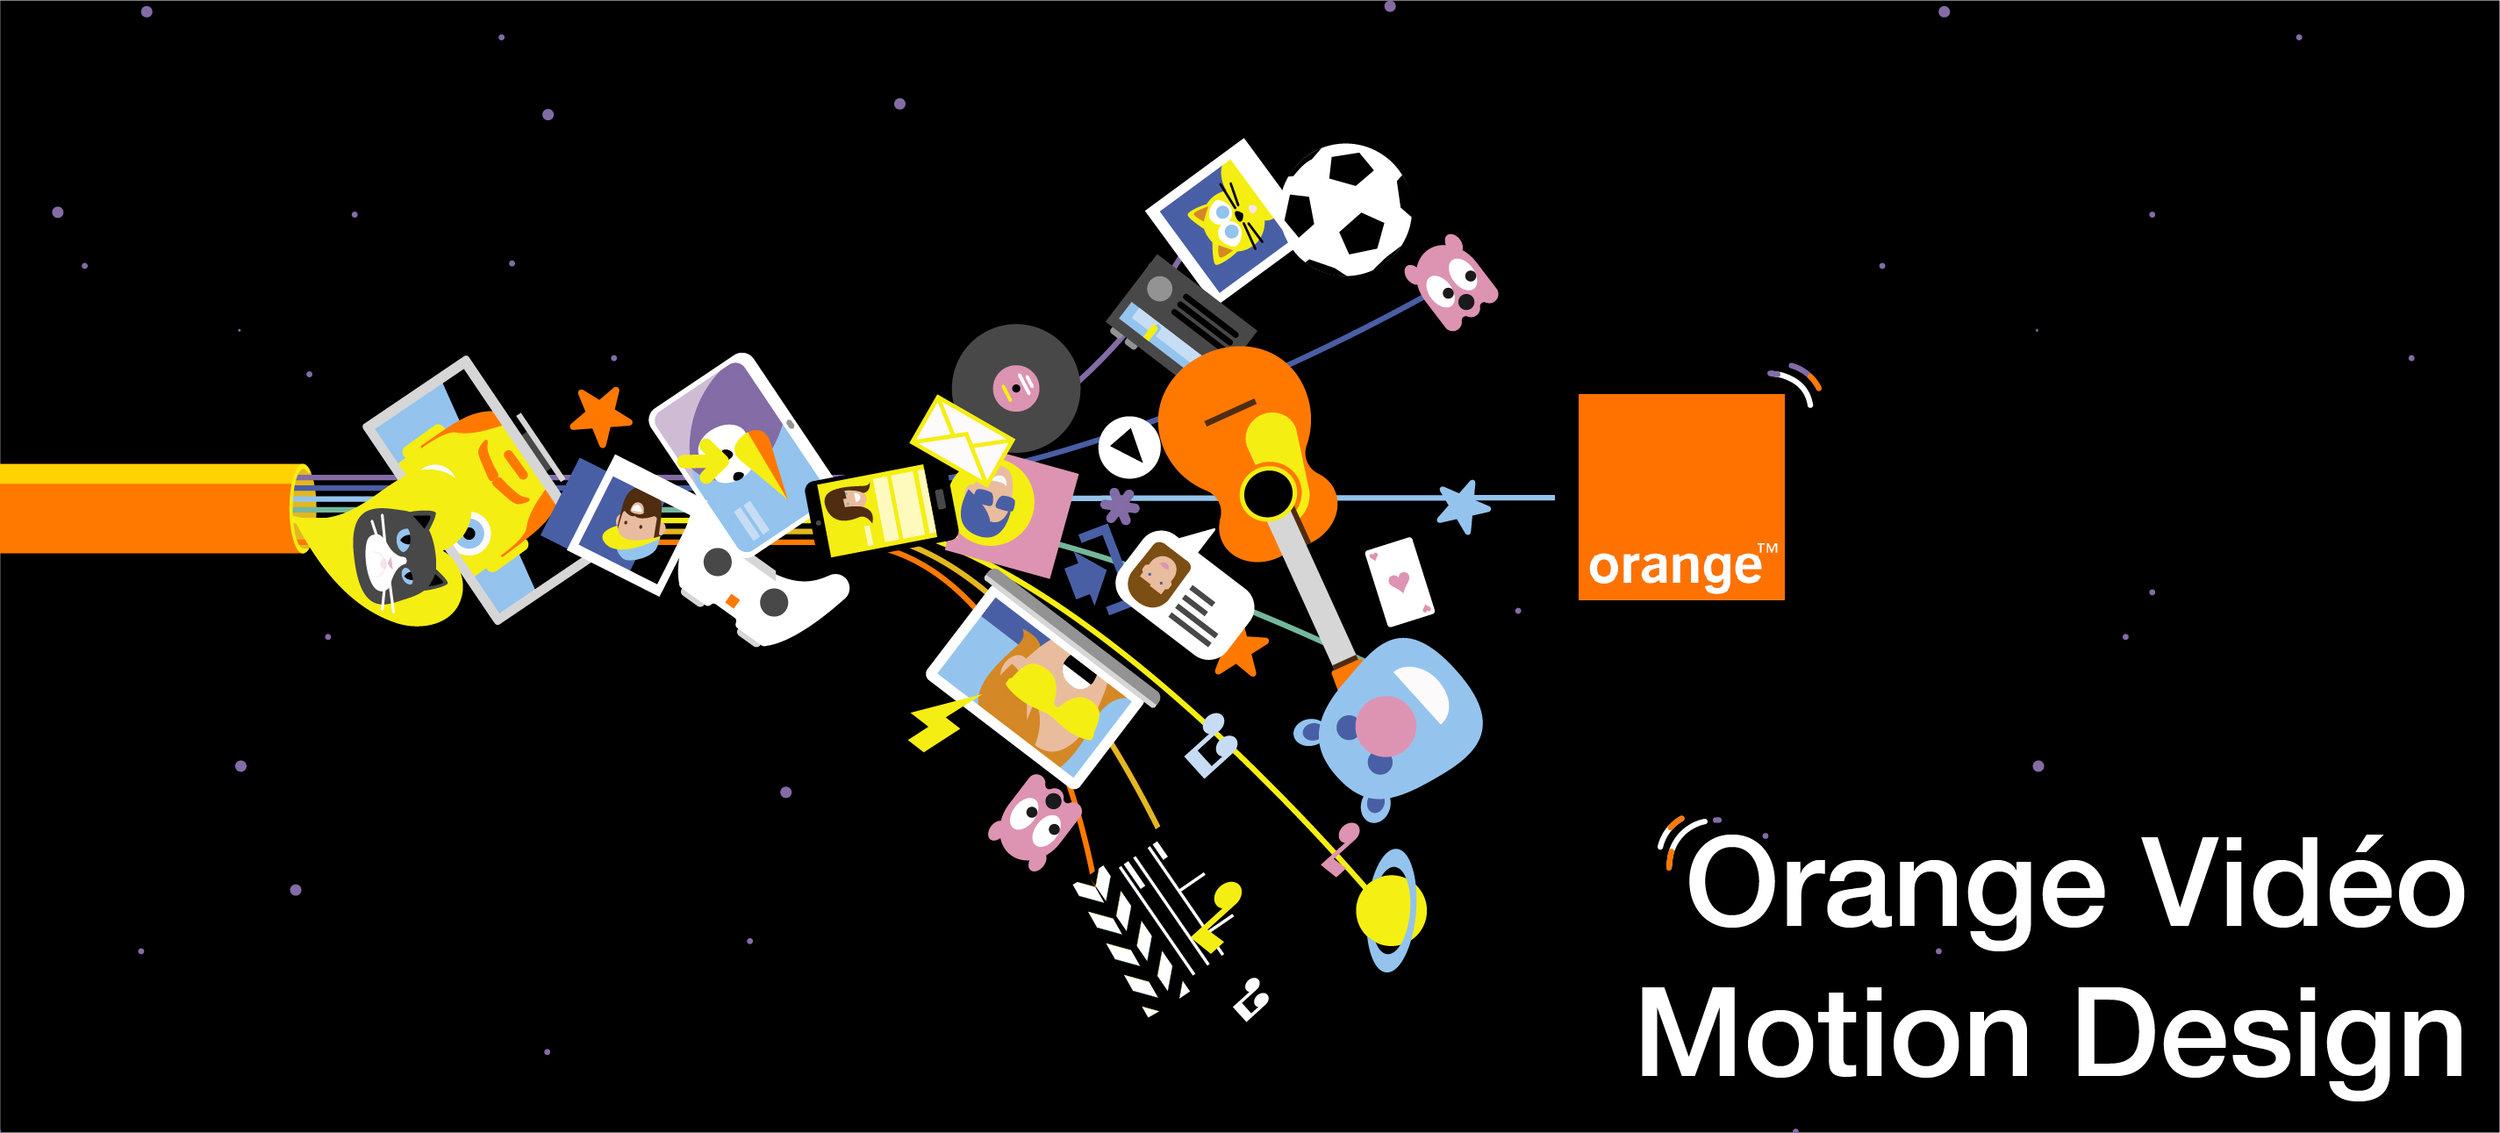 Orange vidéo motion design